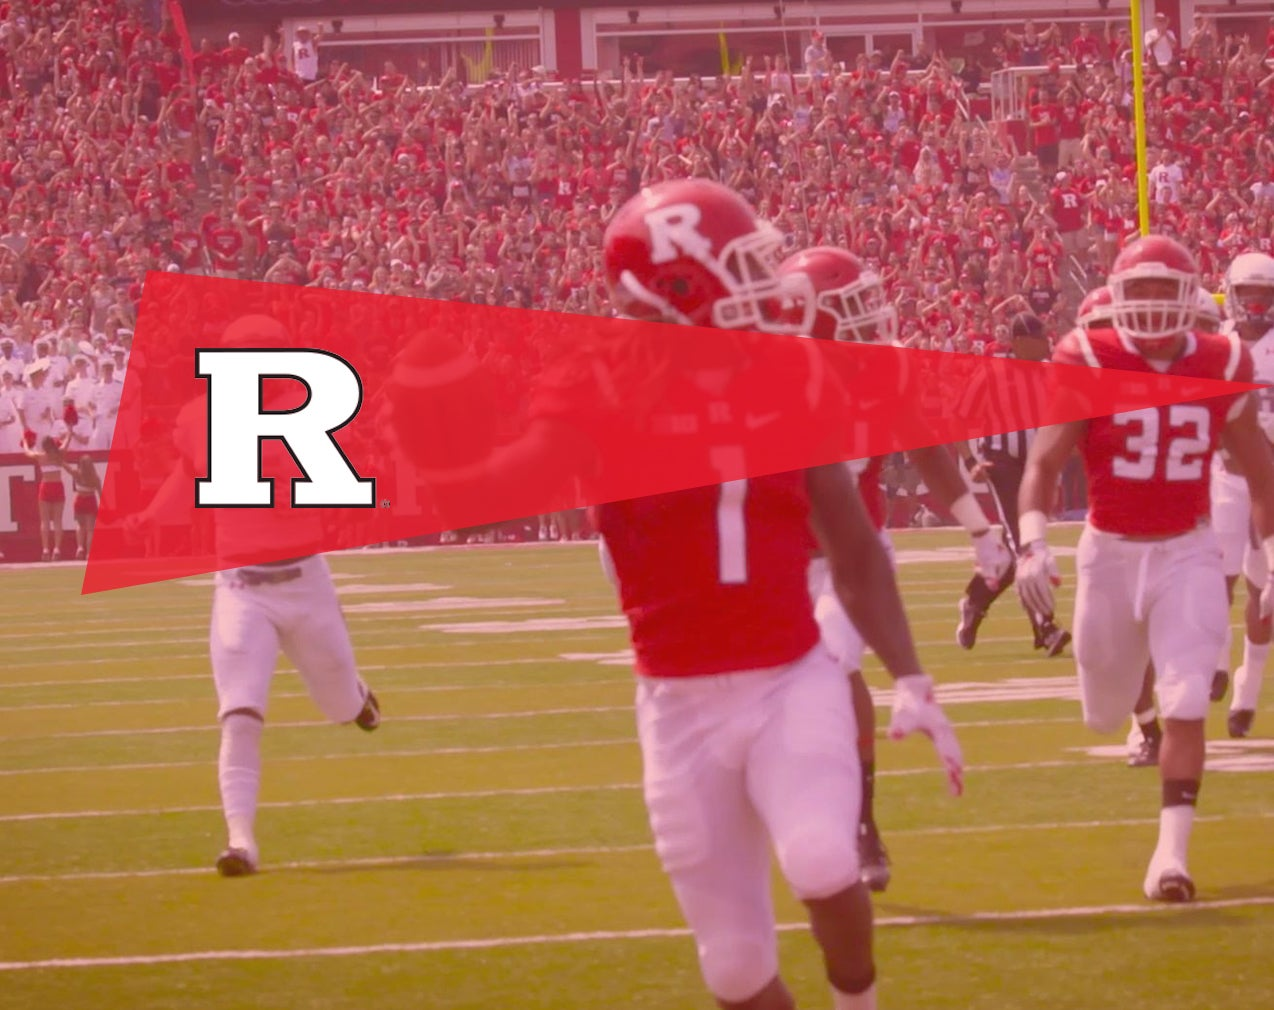 news_Rutgers_thumbnail.jpg